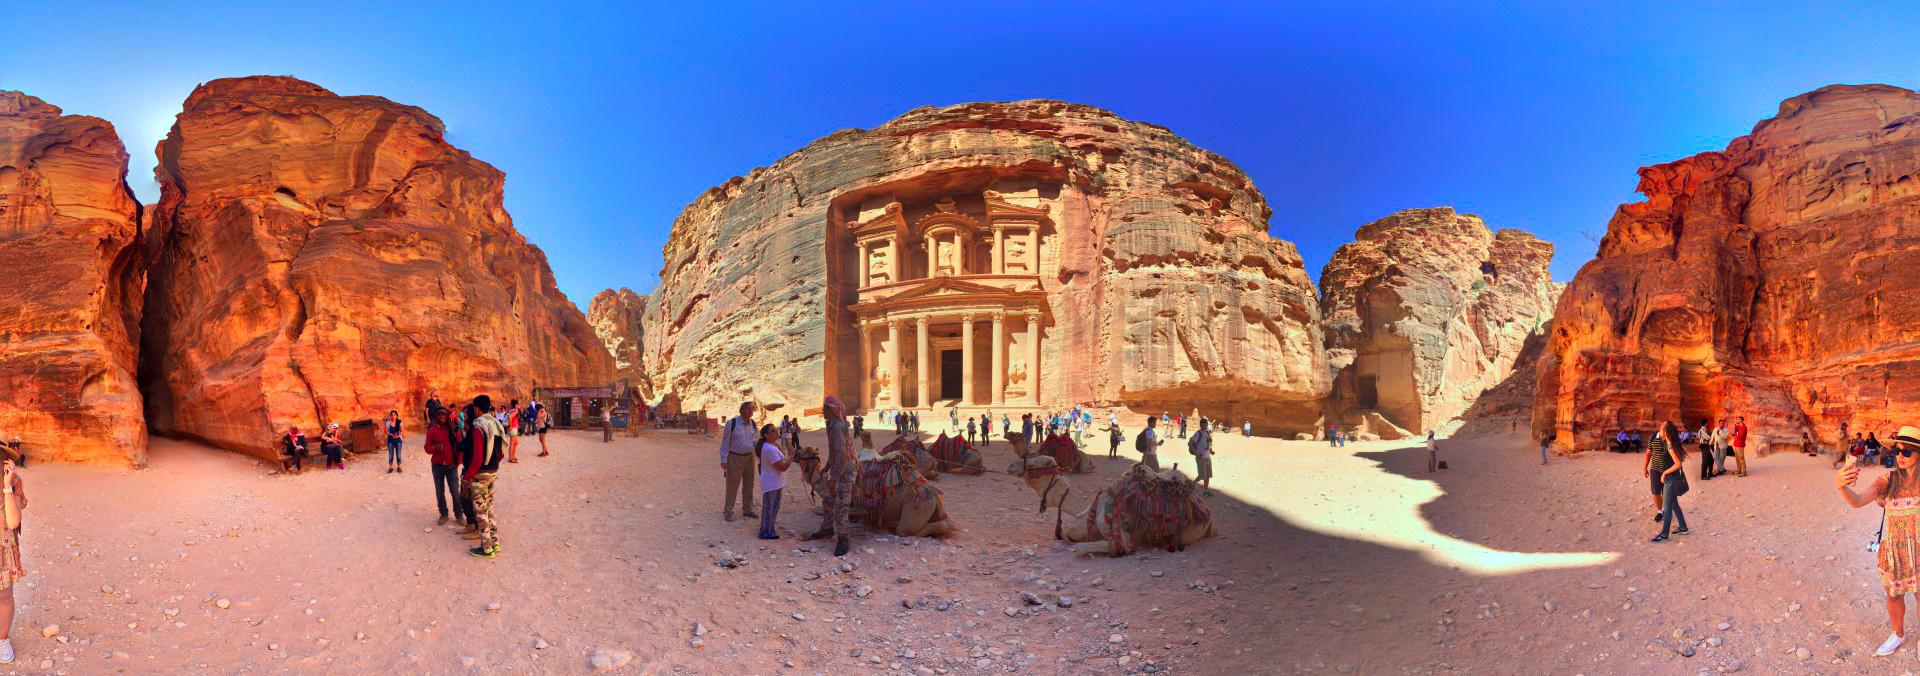 Viajar a Jordania - Ruta por Jordania en una semana - Viajes a Jordania jordania en una semana - 28271126912 54f4f0a851 o - Ruta por Jordania en una semana